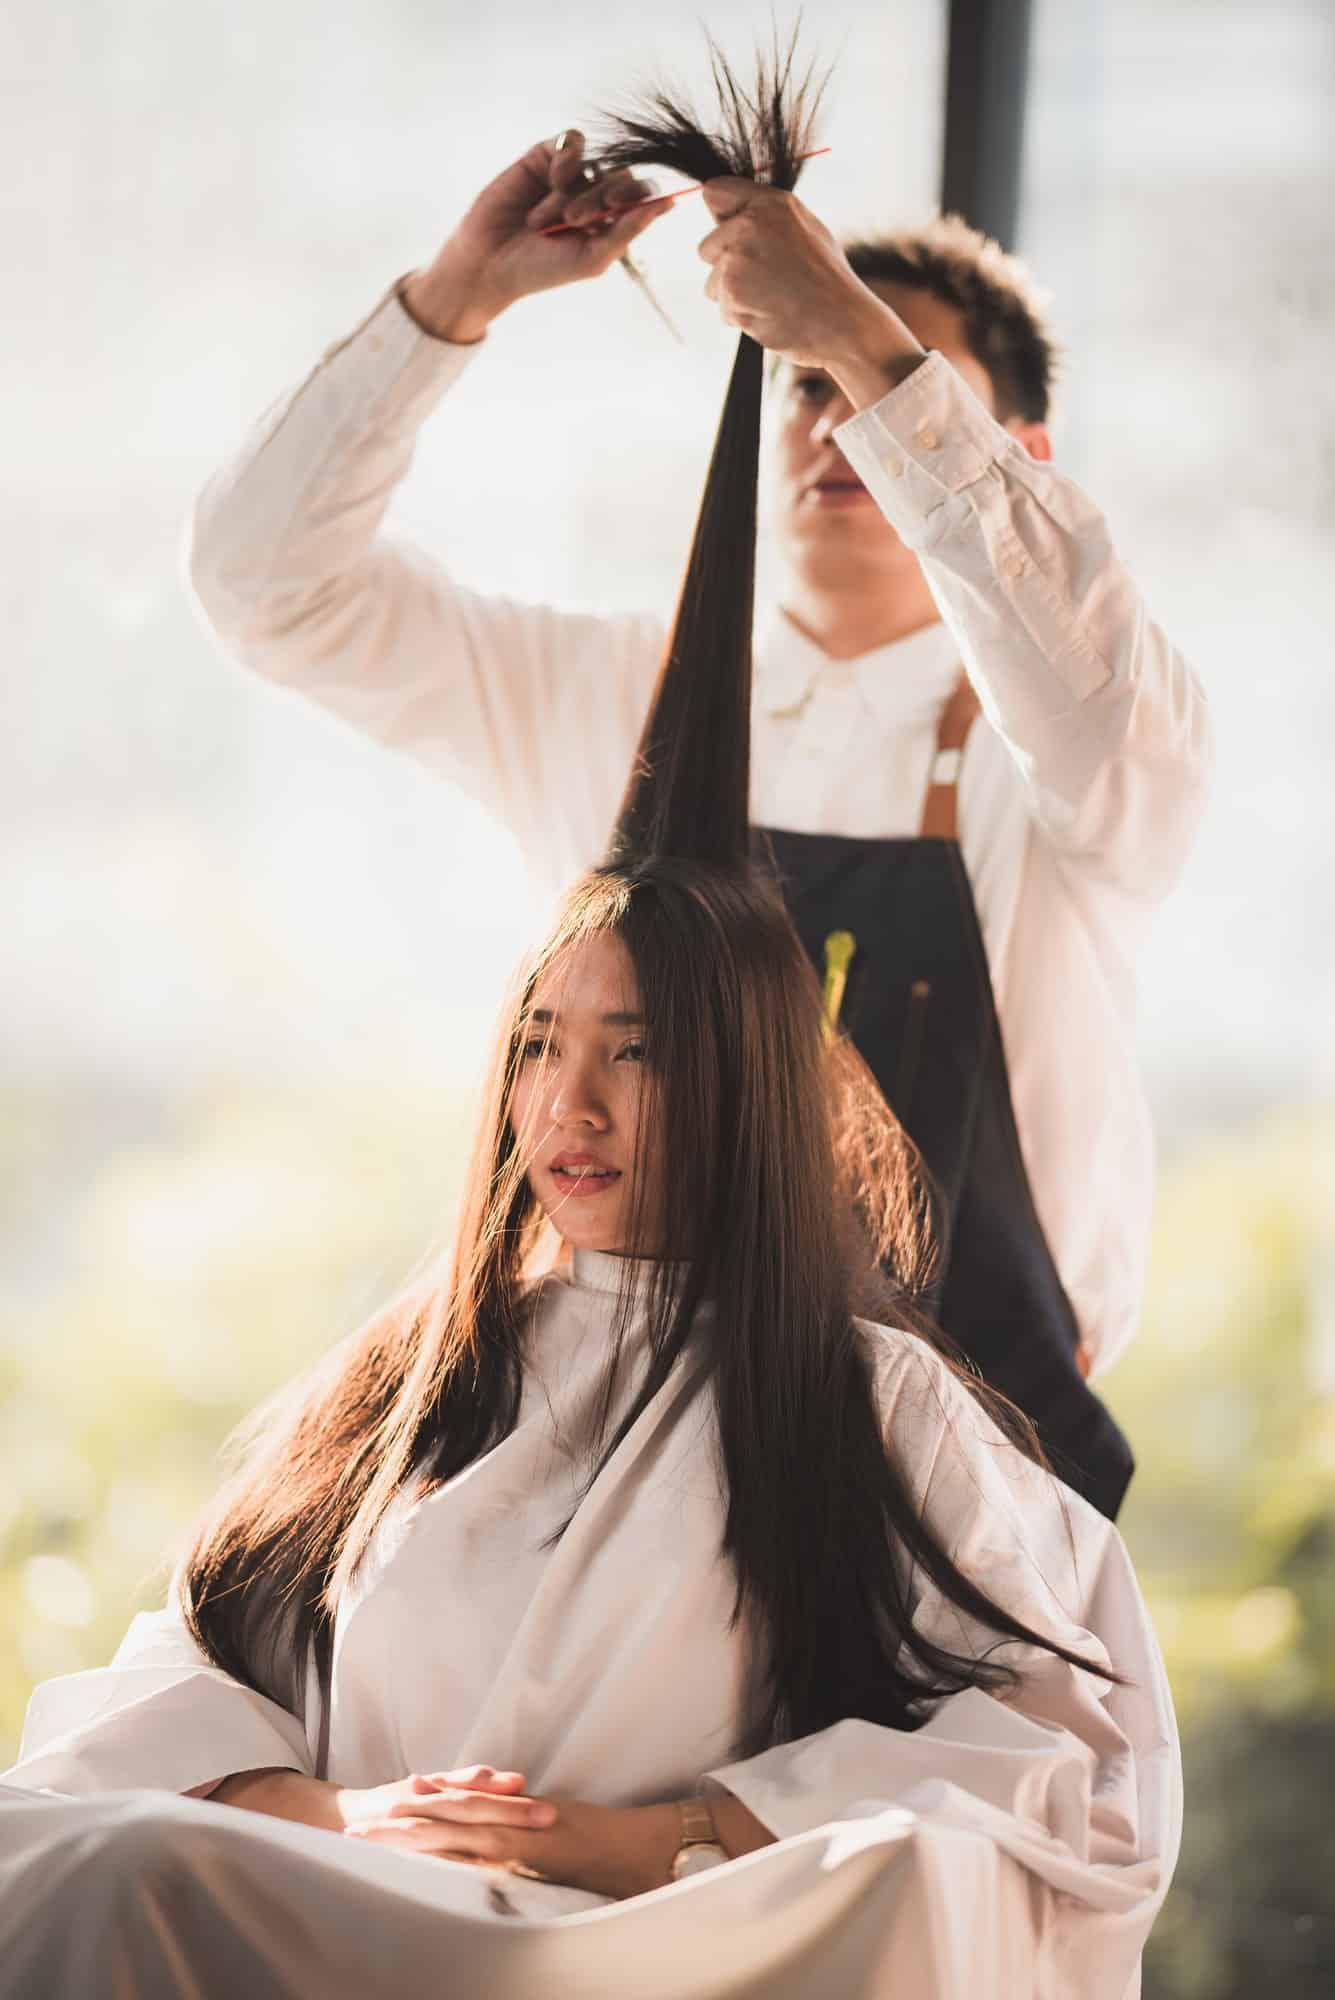 Hairdresser is cutting long hair in hair salon with scissor